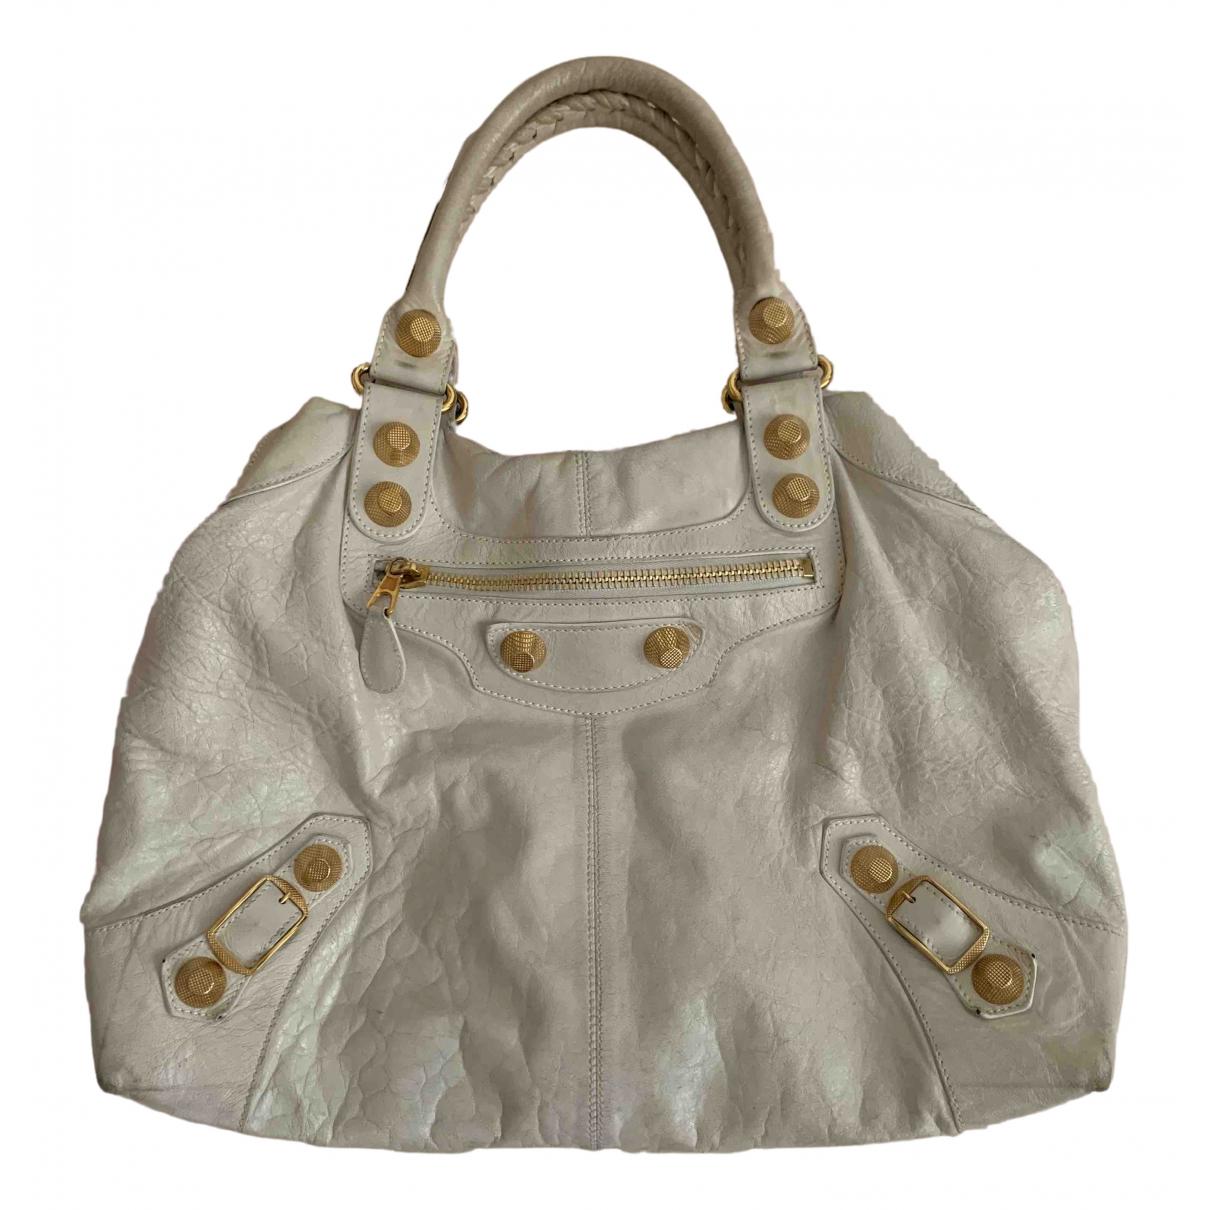 Balenciaga \N White Leather handbag for Women \N